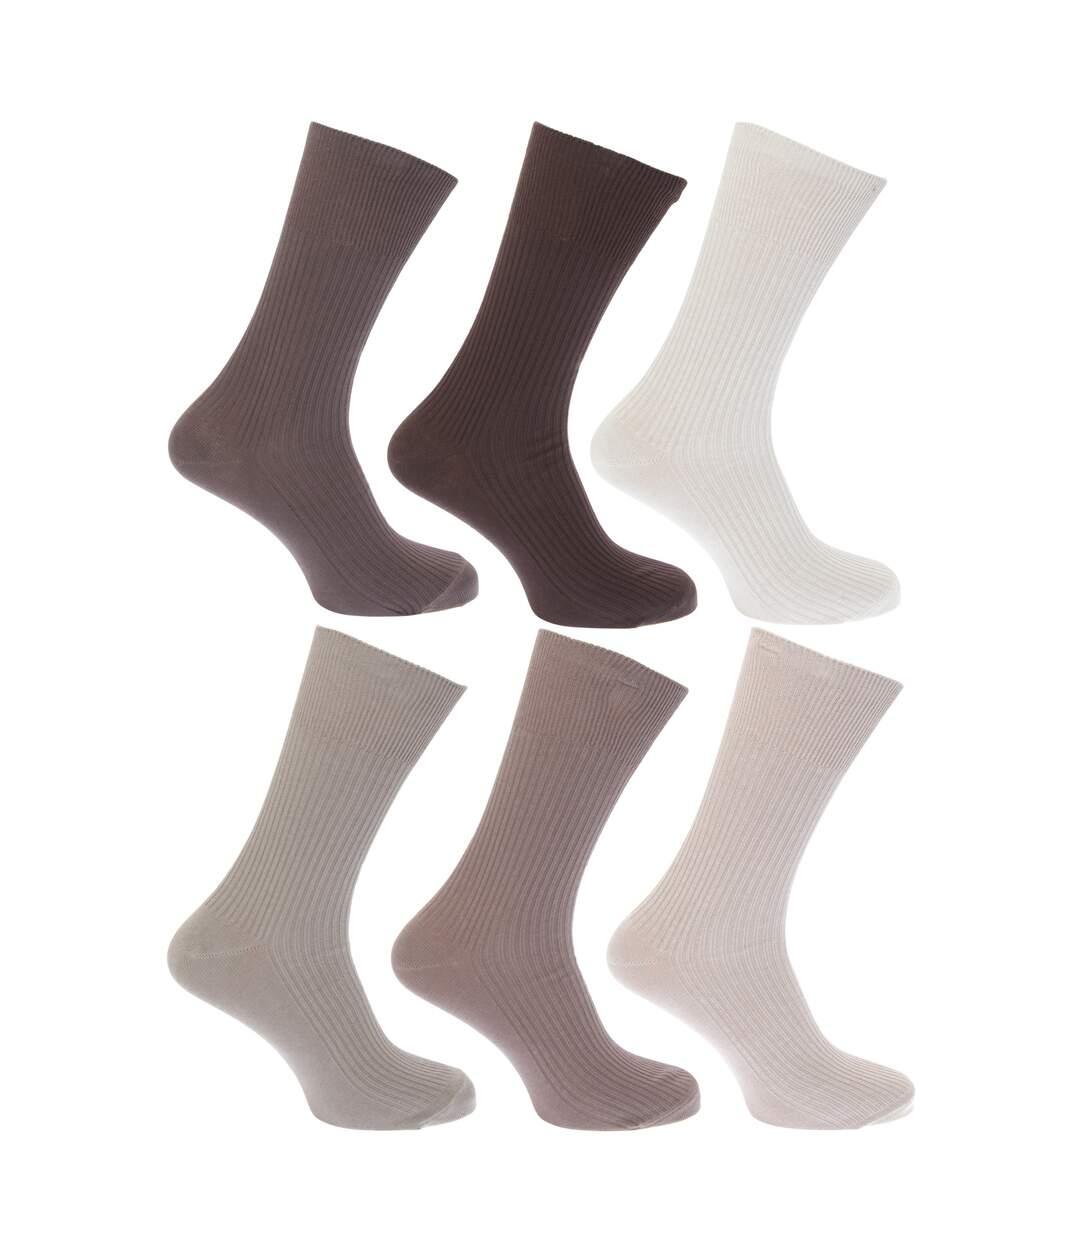 FLOSO Mens Ribbed Non Elastic Top 100% Cotton Socks (Pack Of 6) (Shades of Grey) - UTMB186